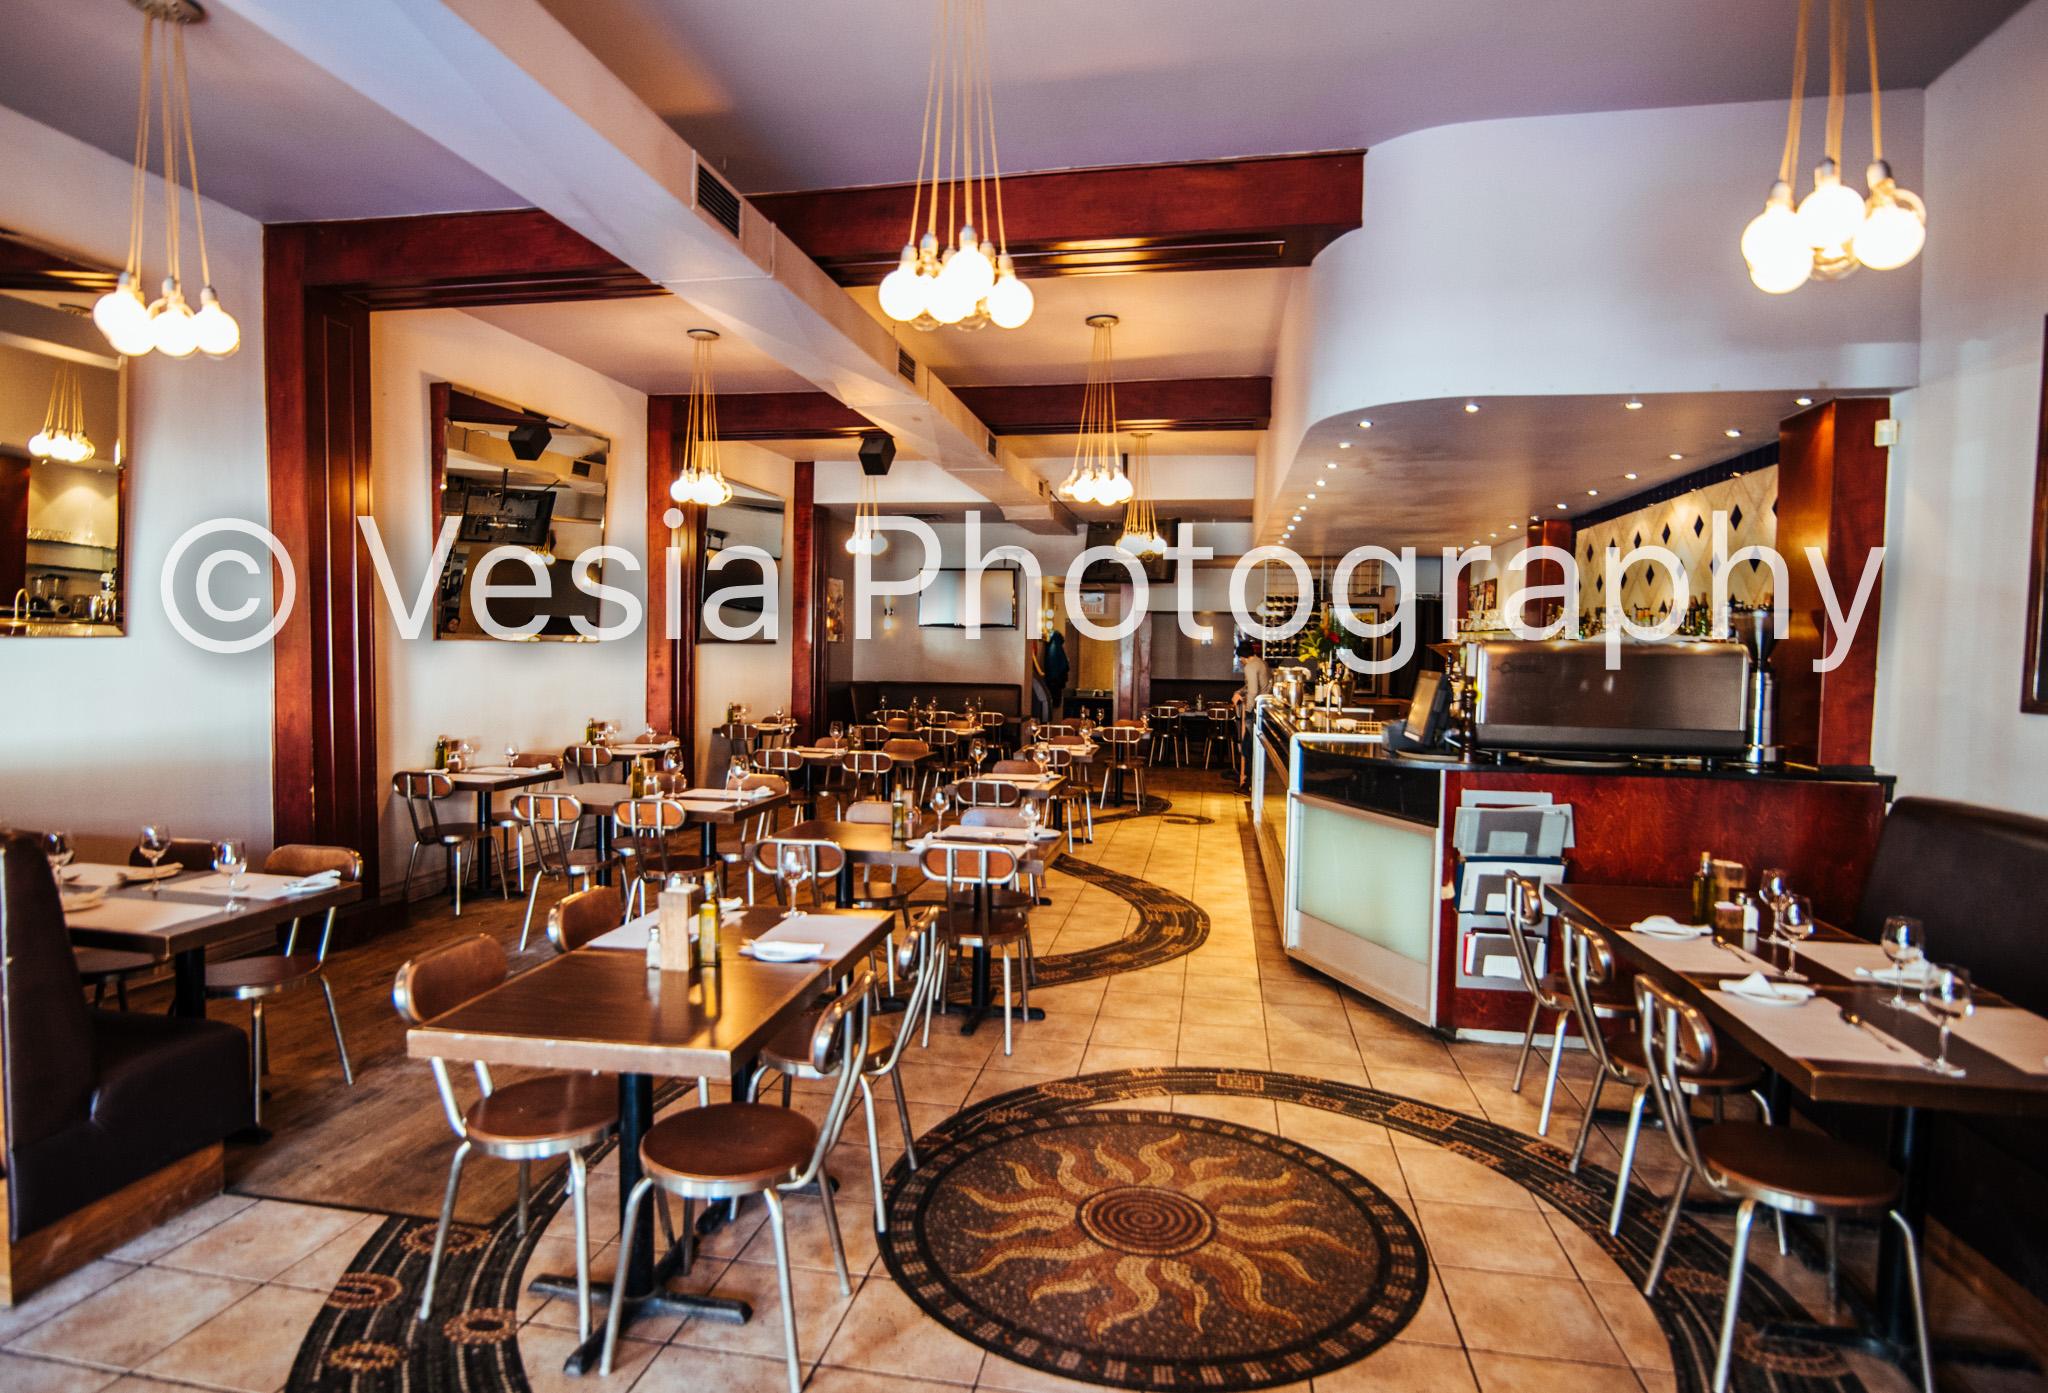 Cafe_Epoca_Proofs-4.jpg